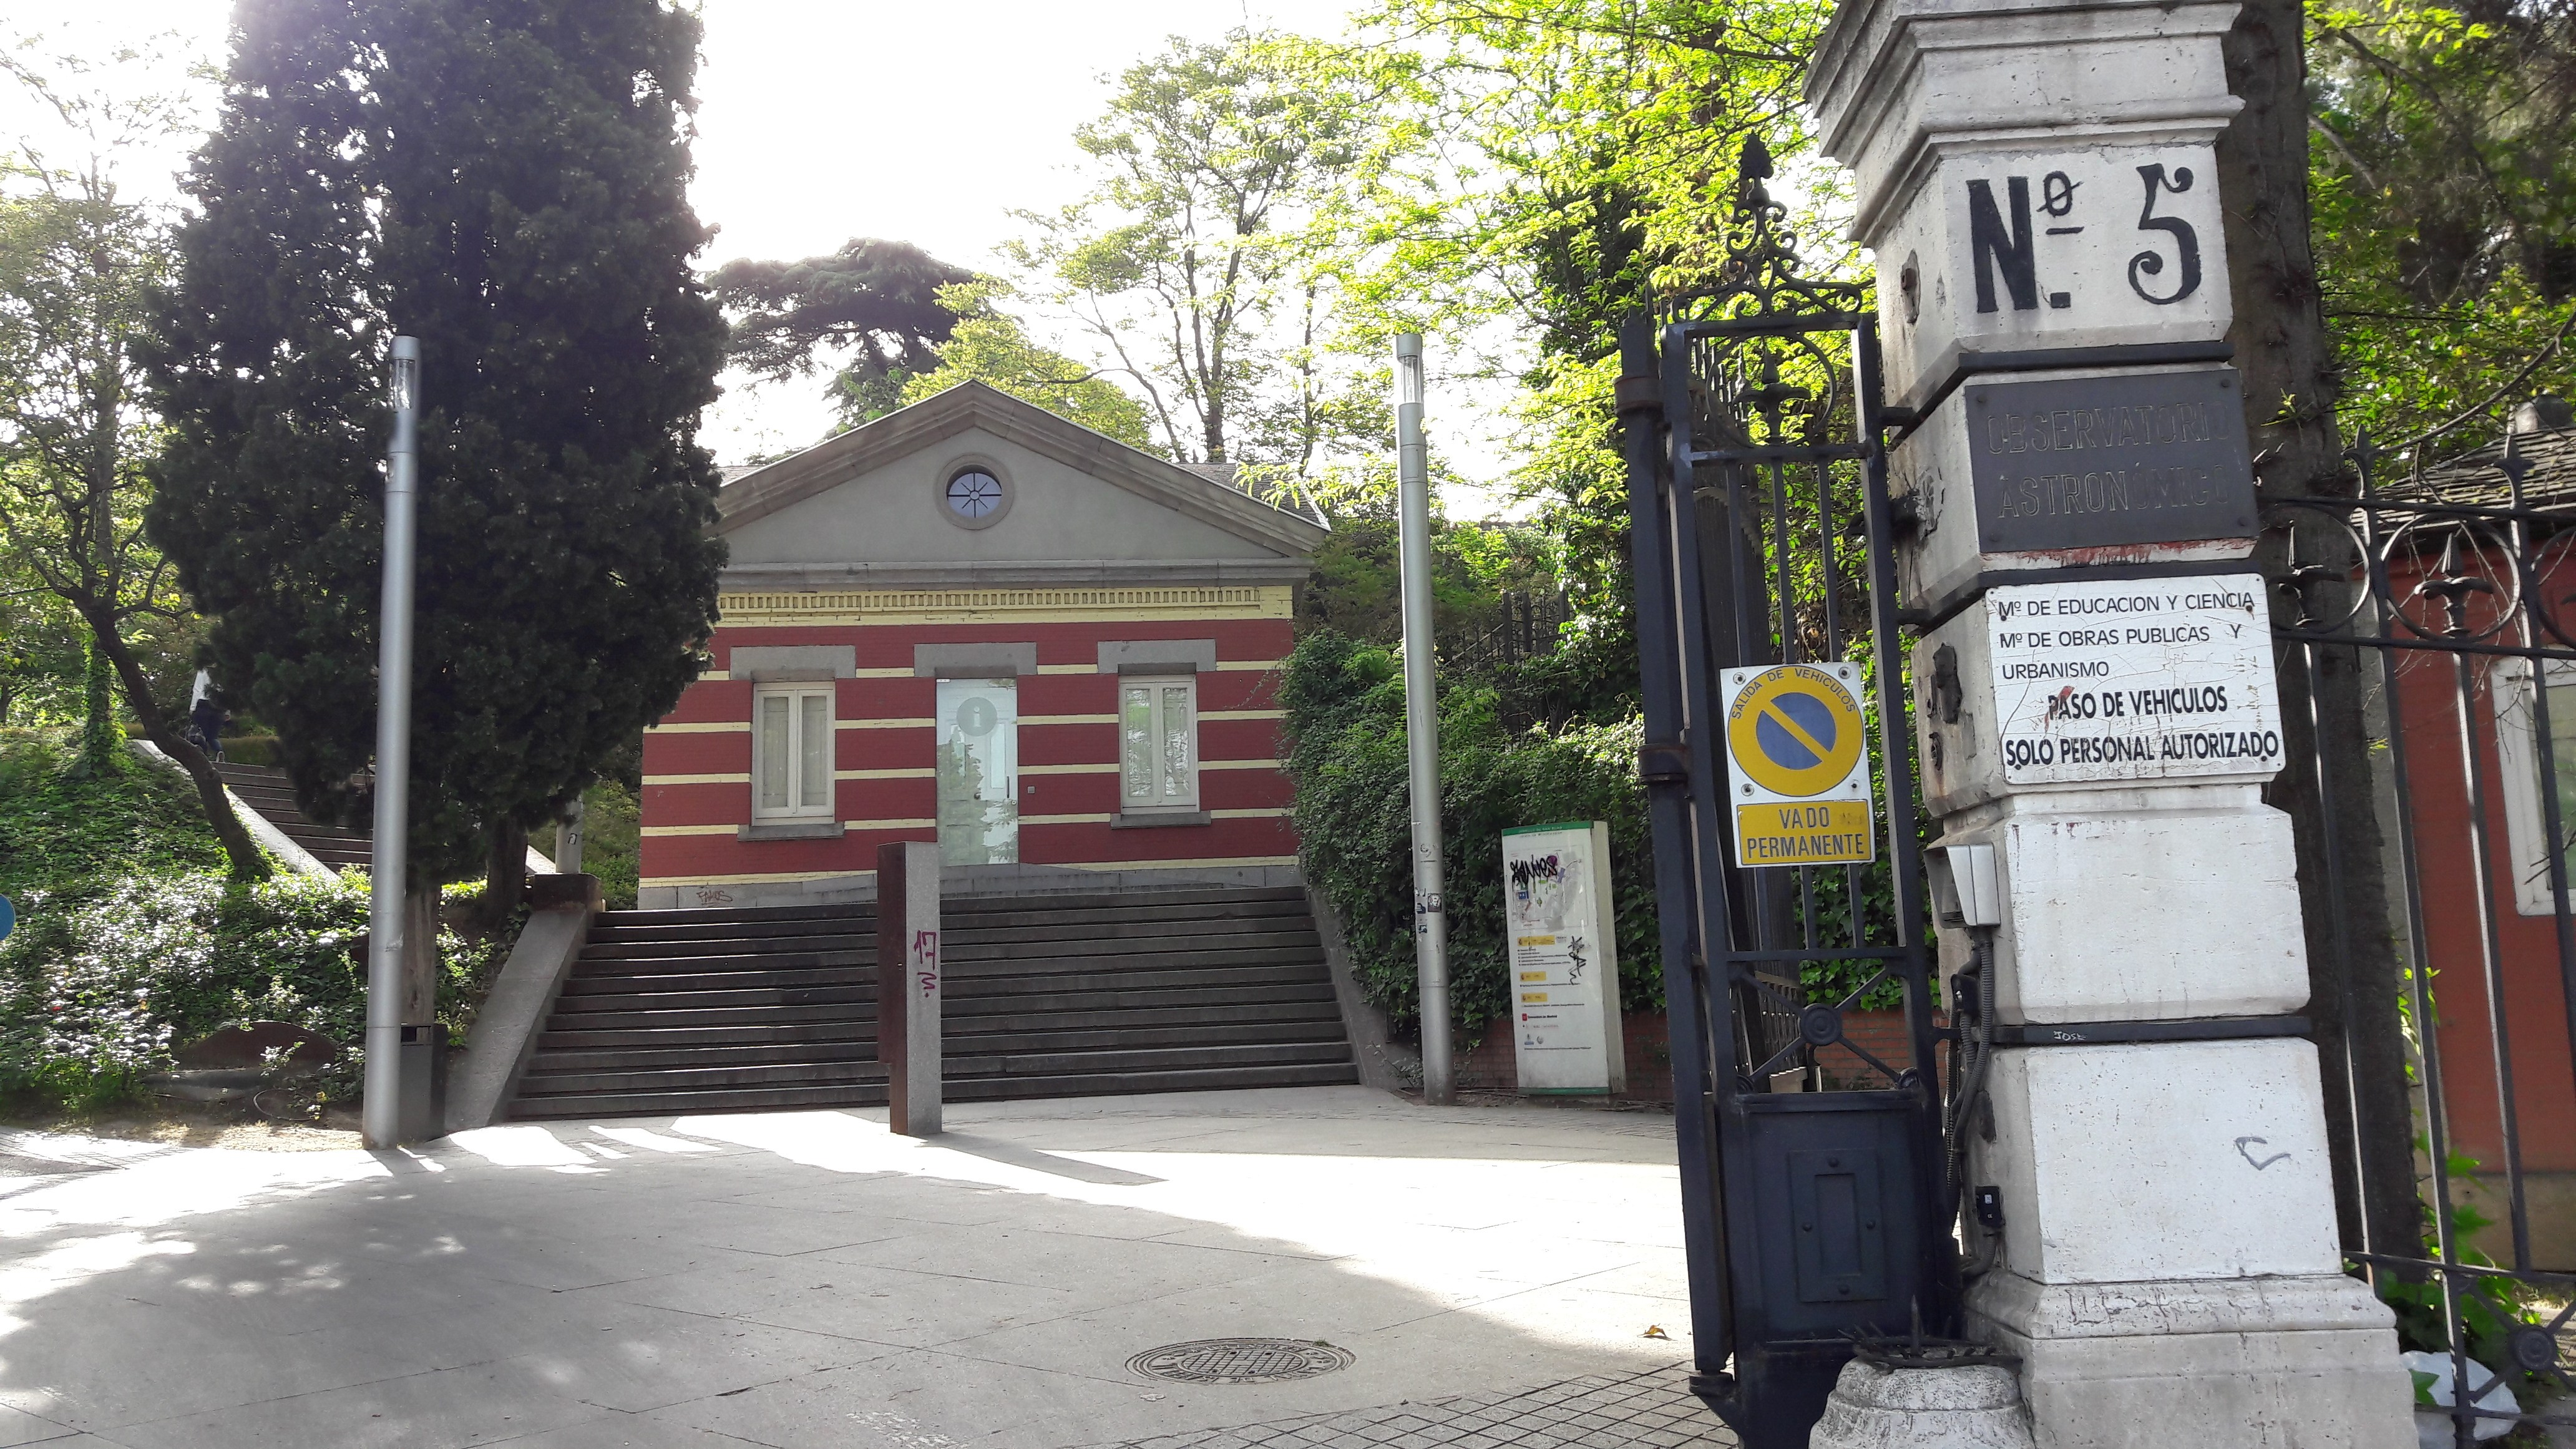 mad-observatorio-astronomico-ent-apr17